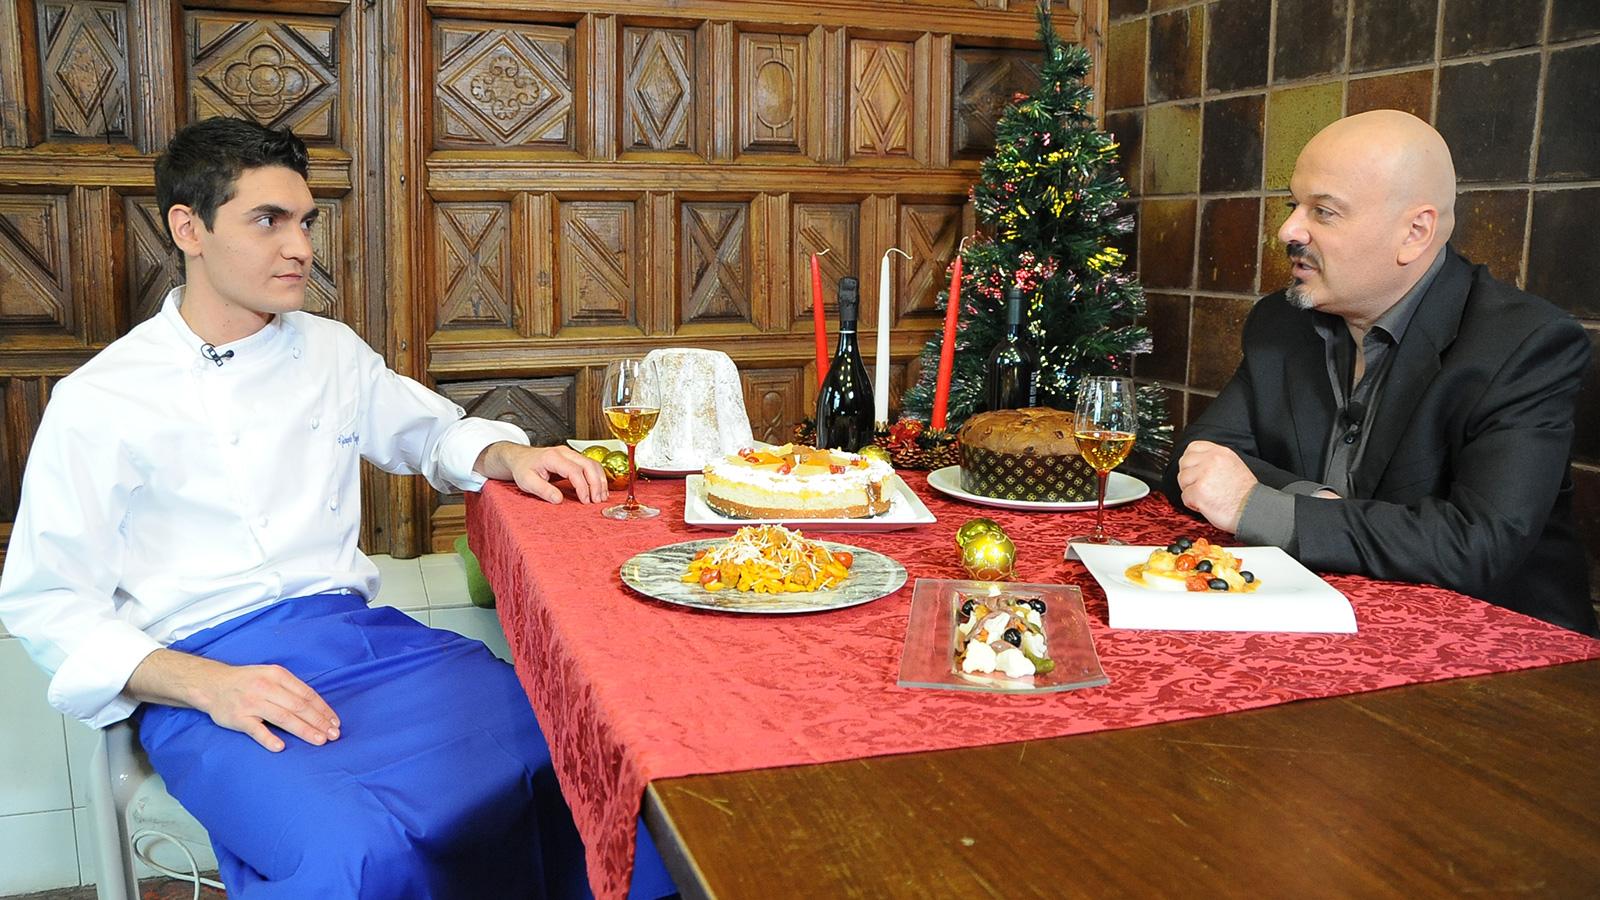 Giorgio parapini cocineros canal cocina - Canal cocina cocineros ...